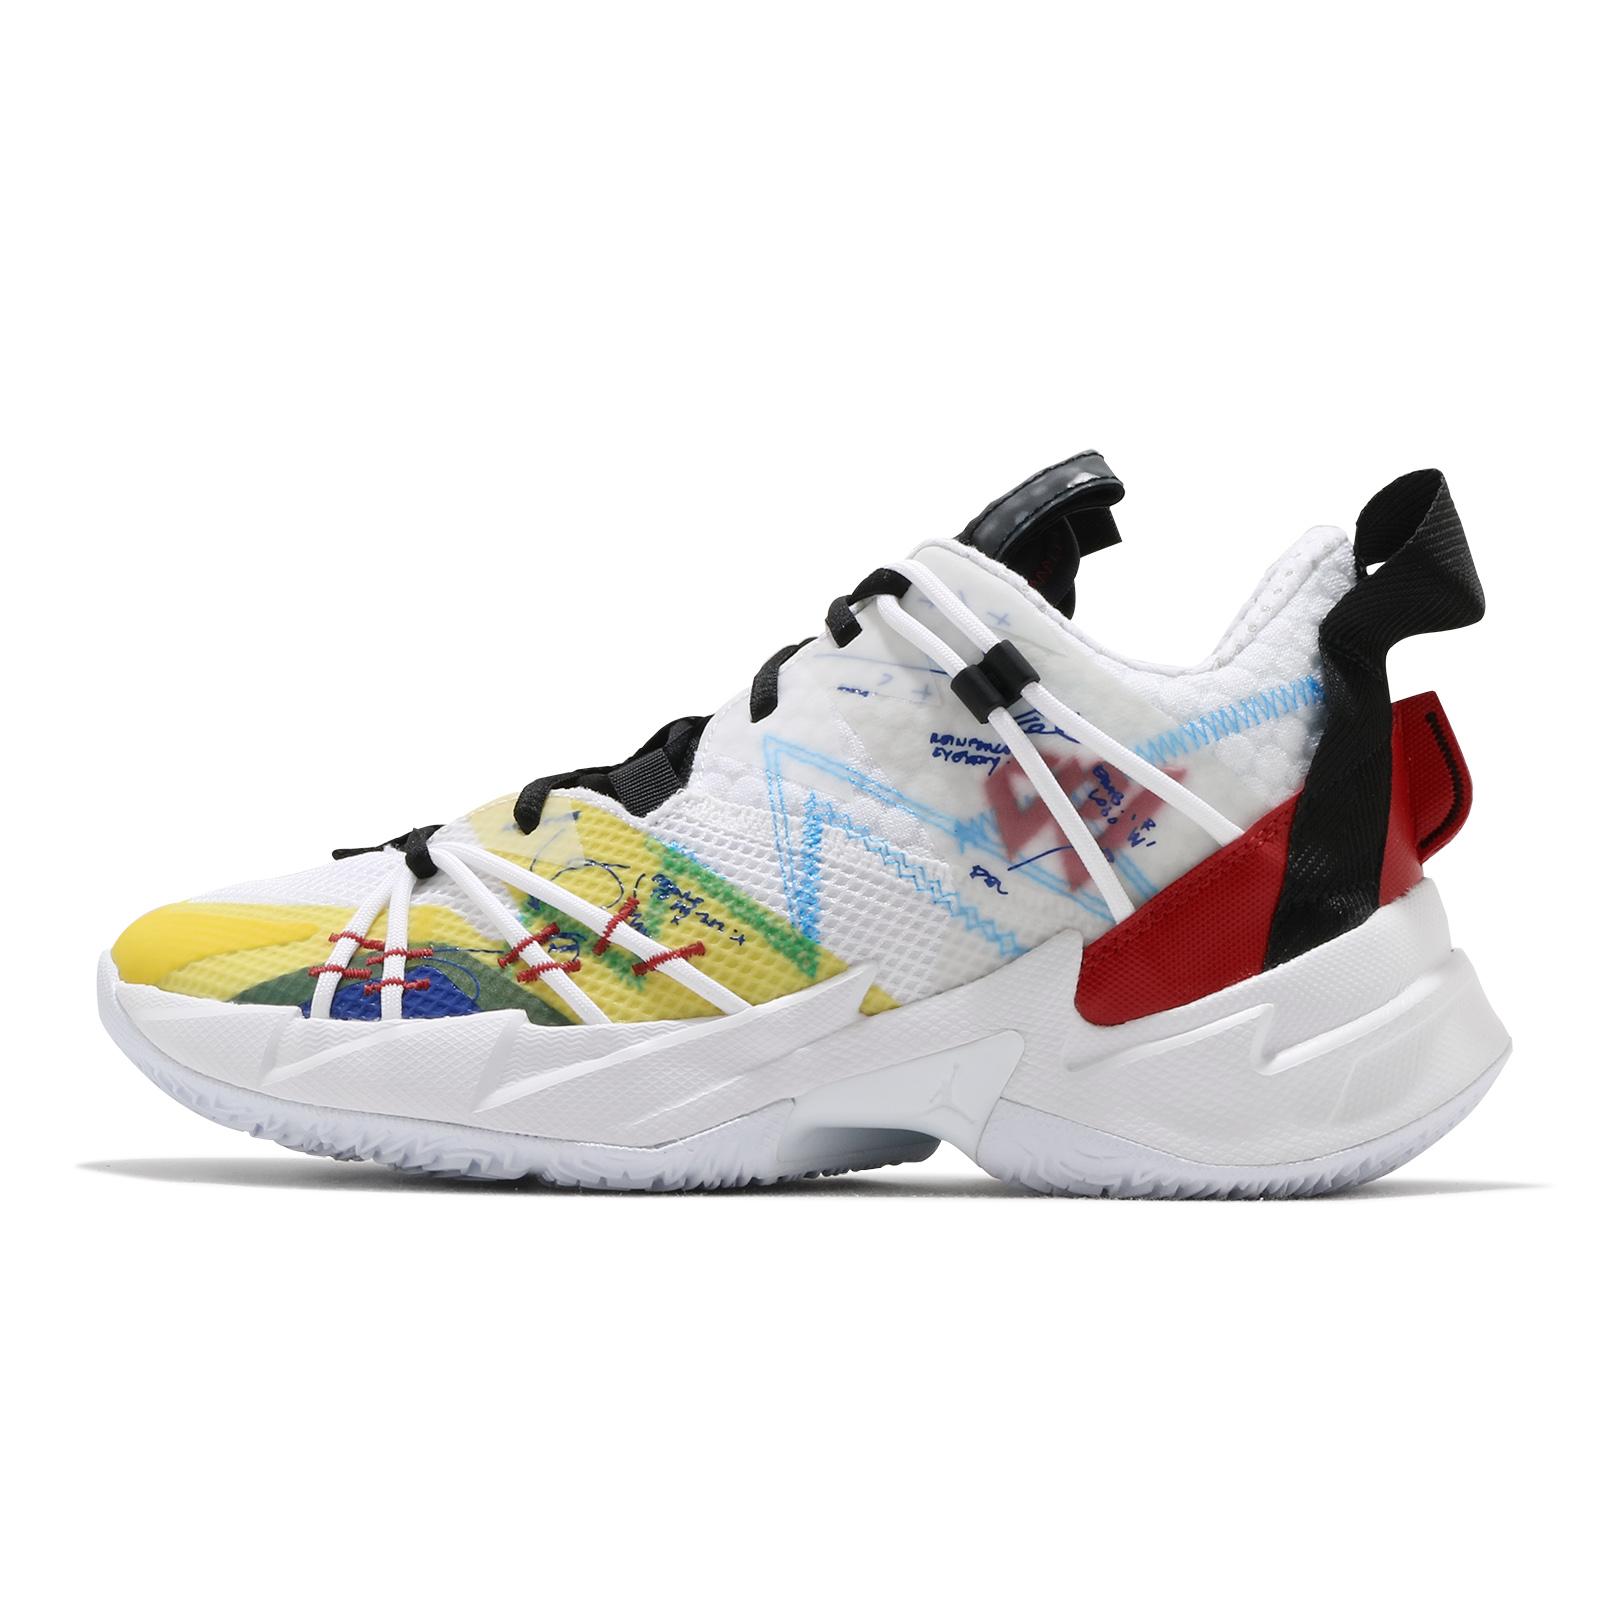 Nike 籃球鞋 Jordan Why Not Zer0.3 SE 白 黃紅 彩色 男鞋【ACS】 CK6612-100